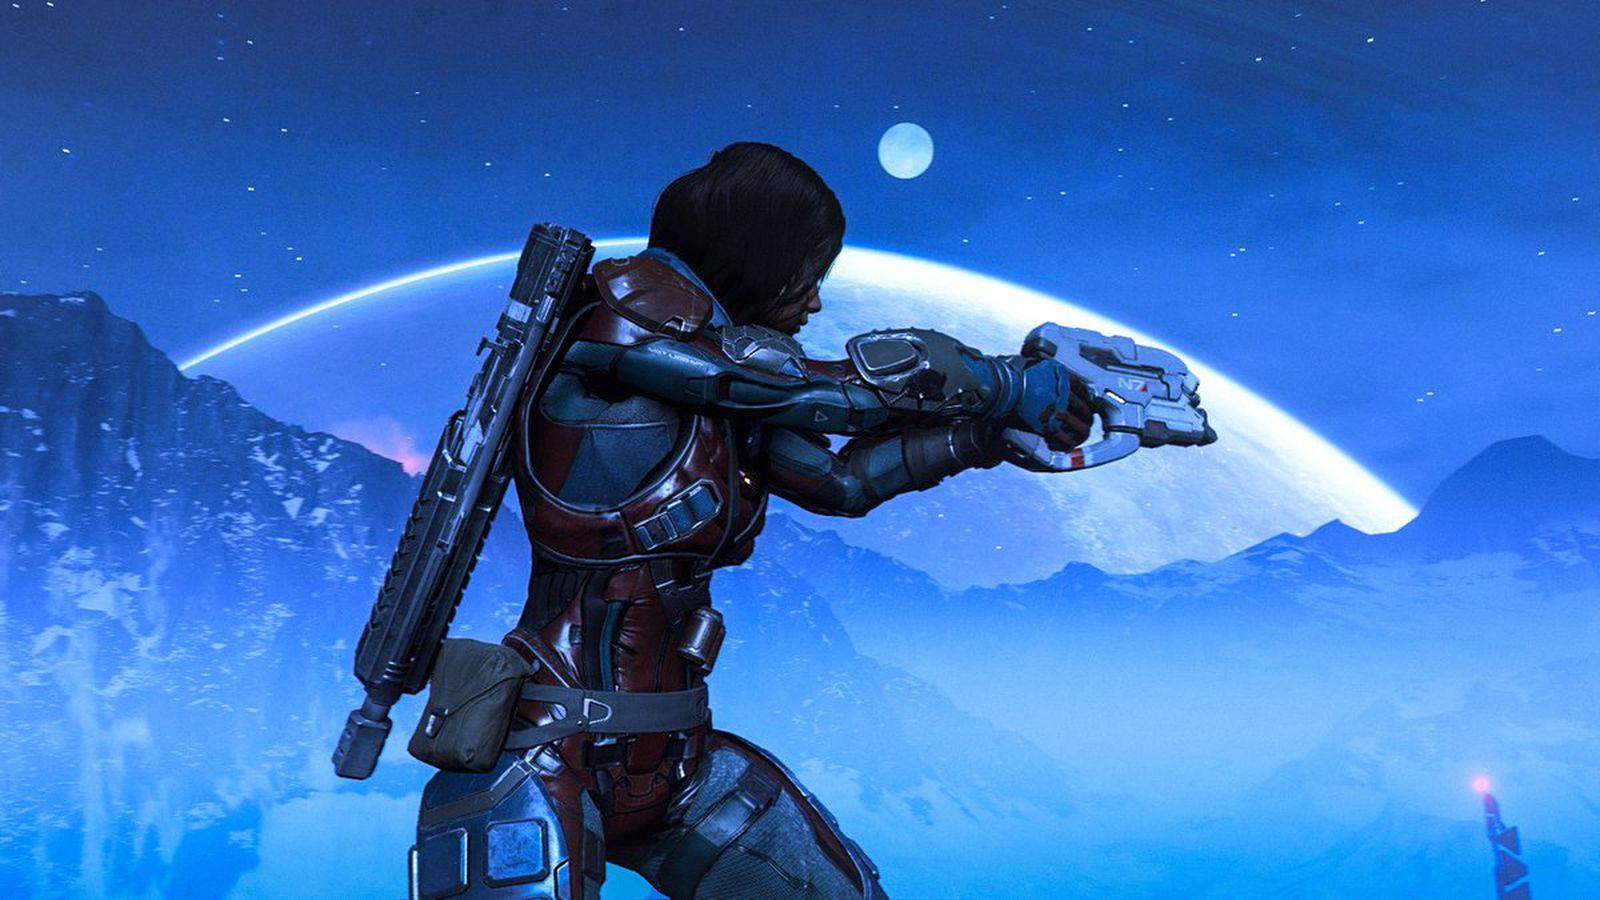 Today's Mass Effect: Andromeda patch focuses on multiplayer tweaks, cinematics